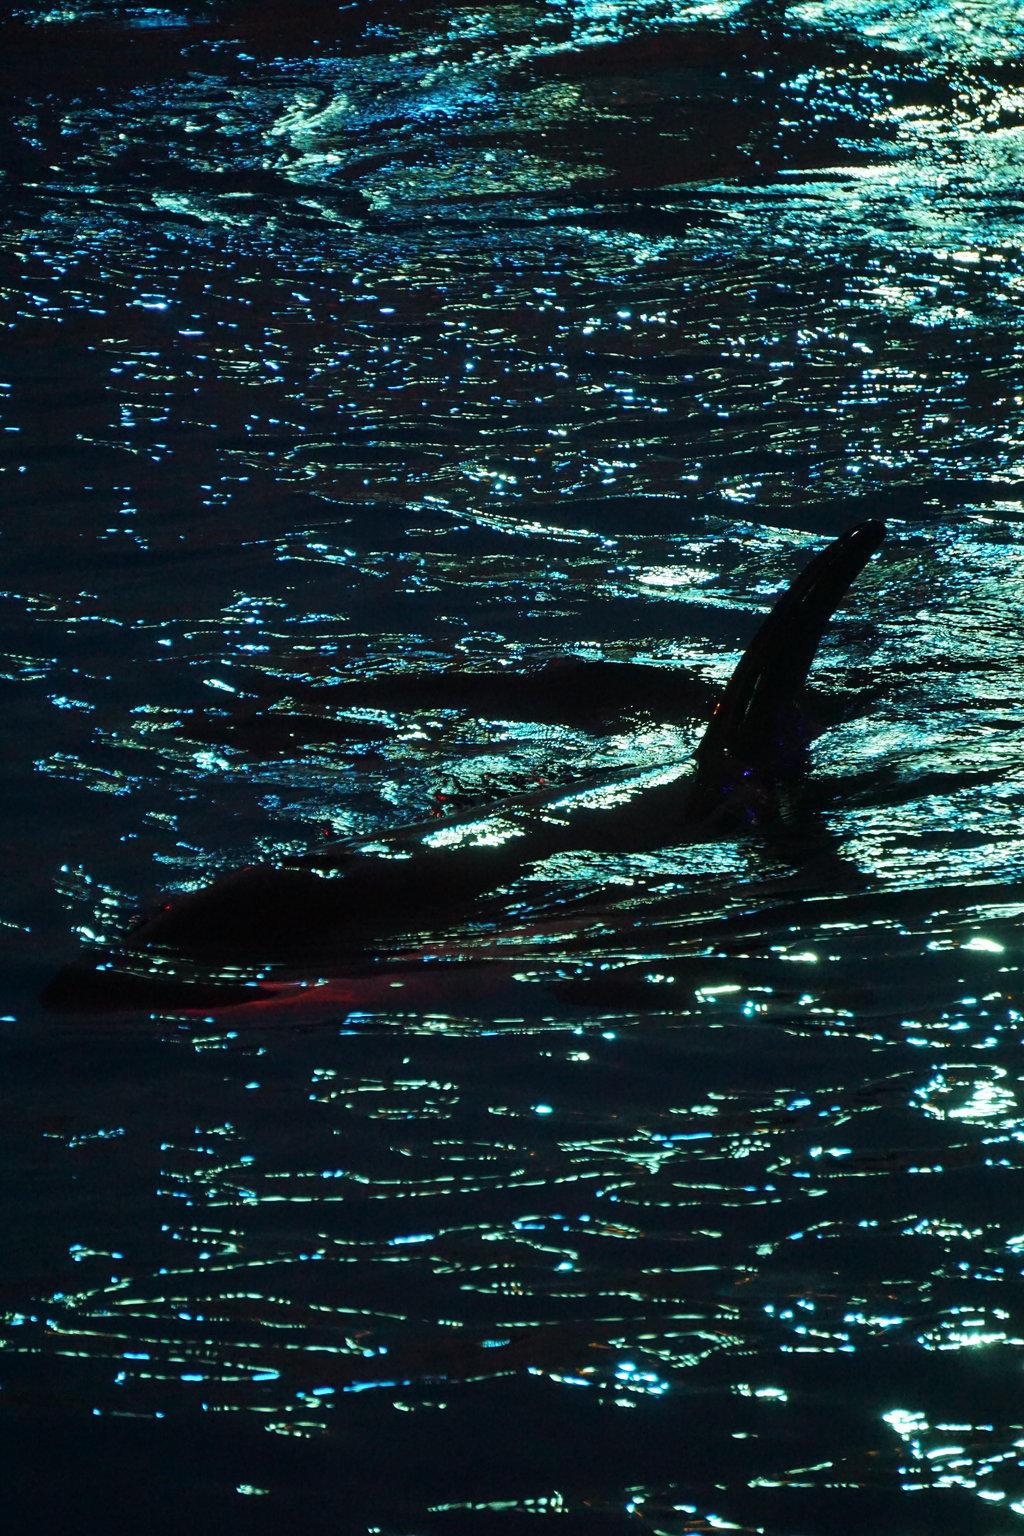 Nighttime silhouette by shinigamisgem